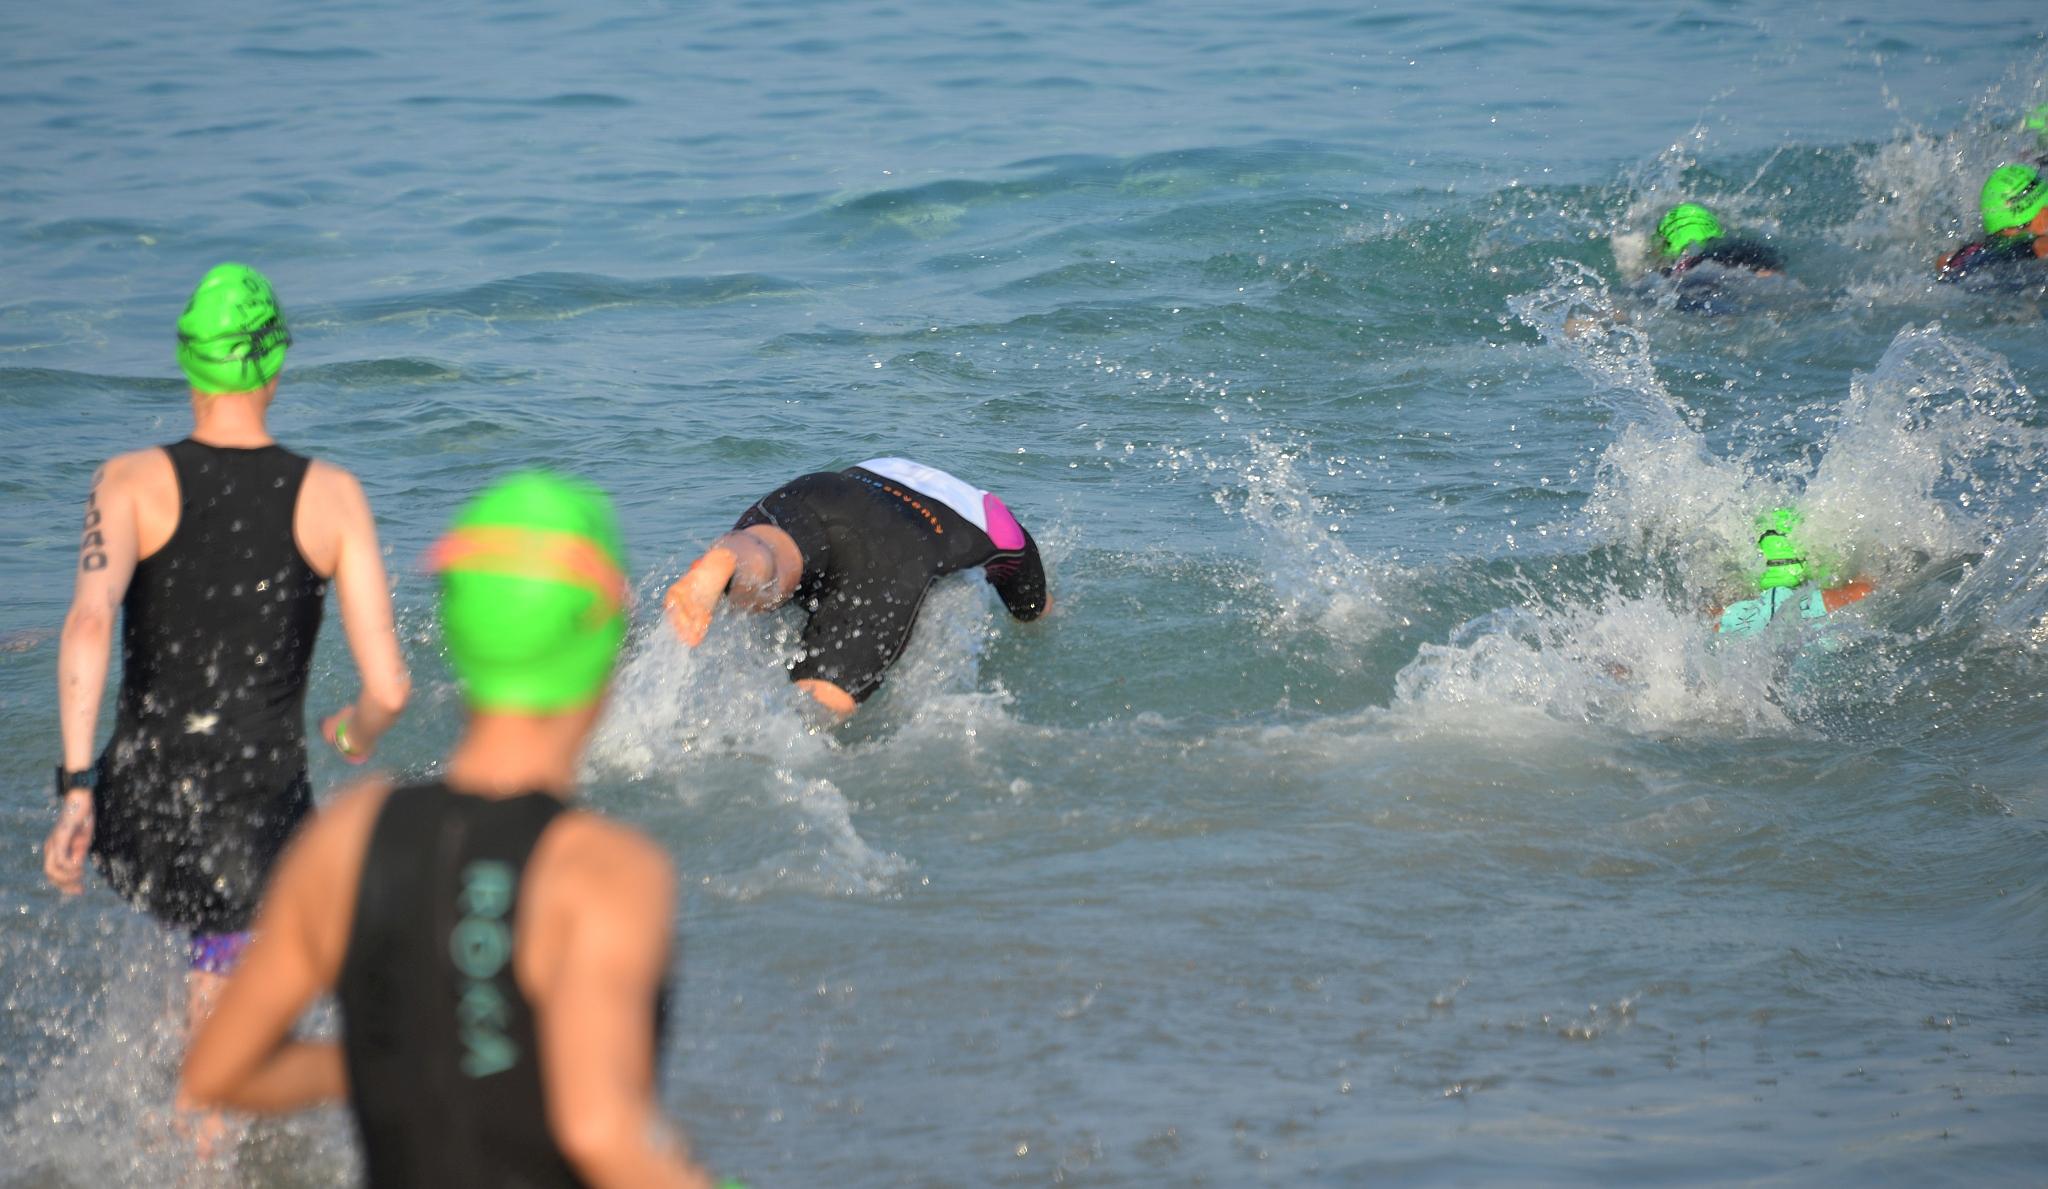 Coach_Terry_Wilson_Gemma_Hollis_Ironman_Hawaii_70.3_Push_Glide_Kick_E3TS_E3_Training_Solutions.JPG